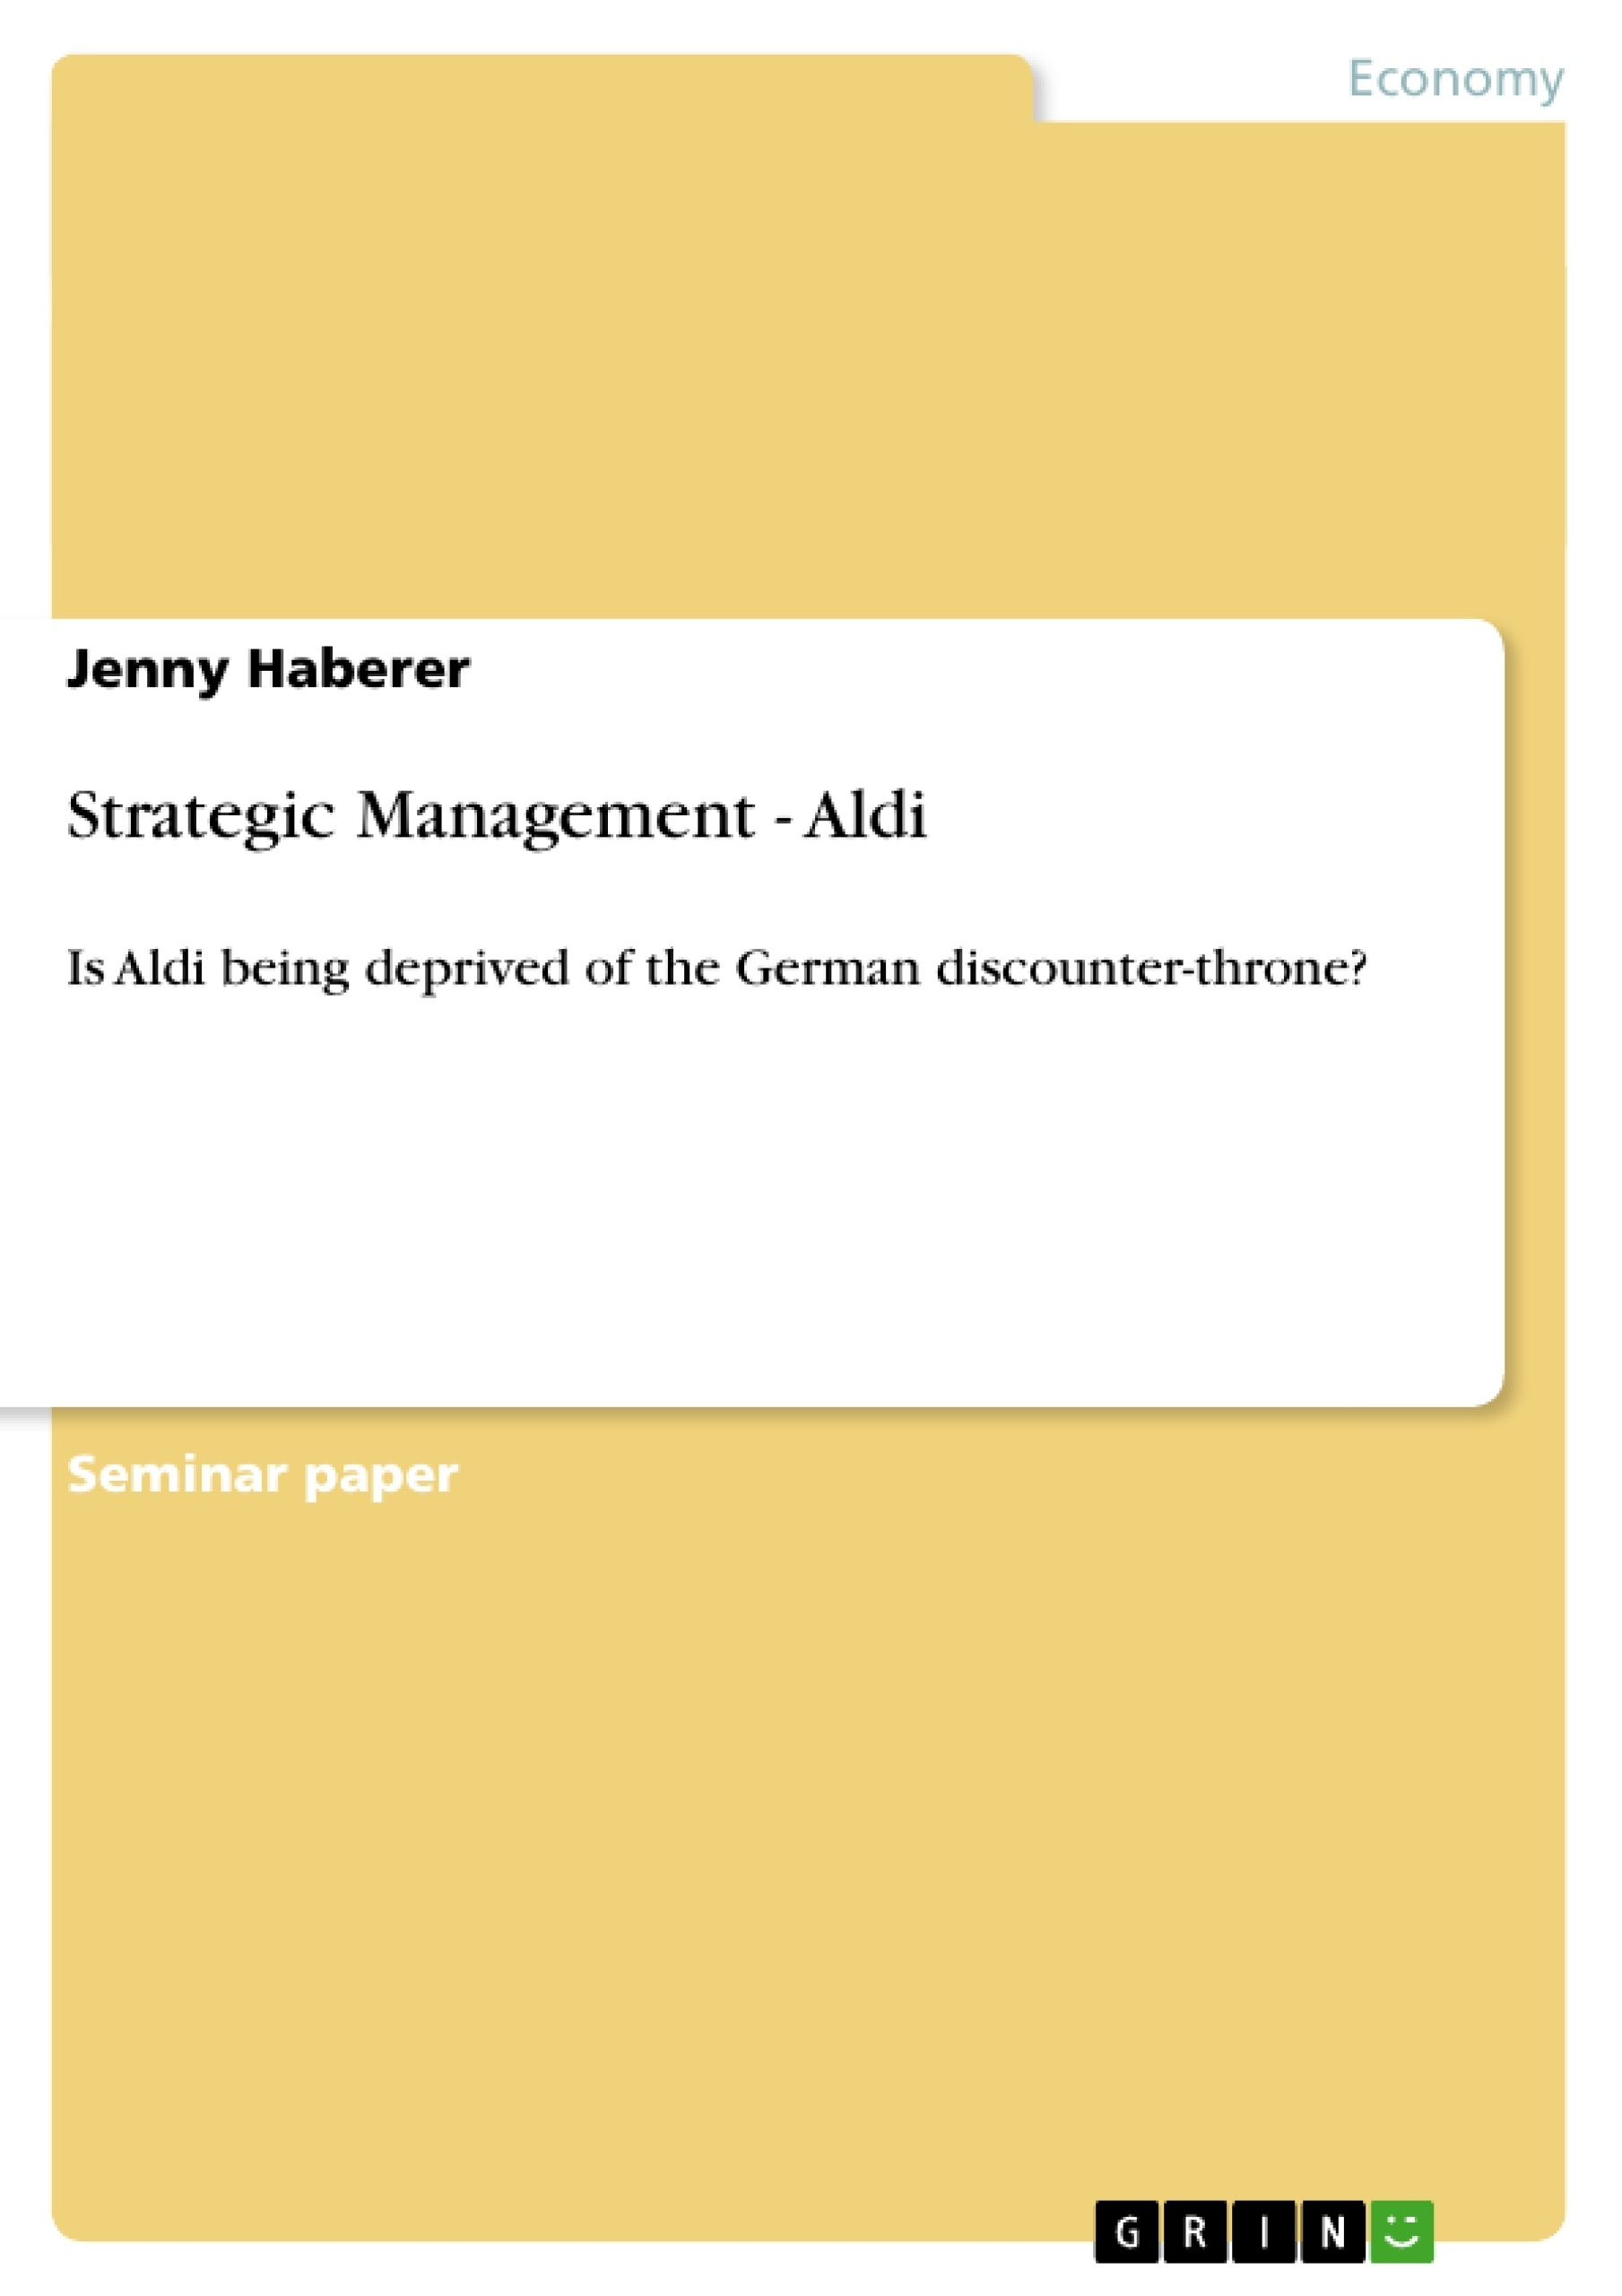 strategic management aldi publish your master s thesis strategic management aldi publish your master s thesis bachelor s thesis essay or term paper